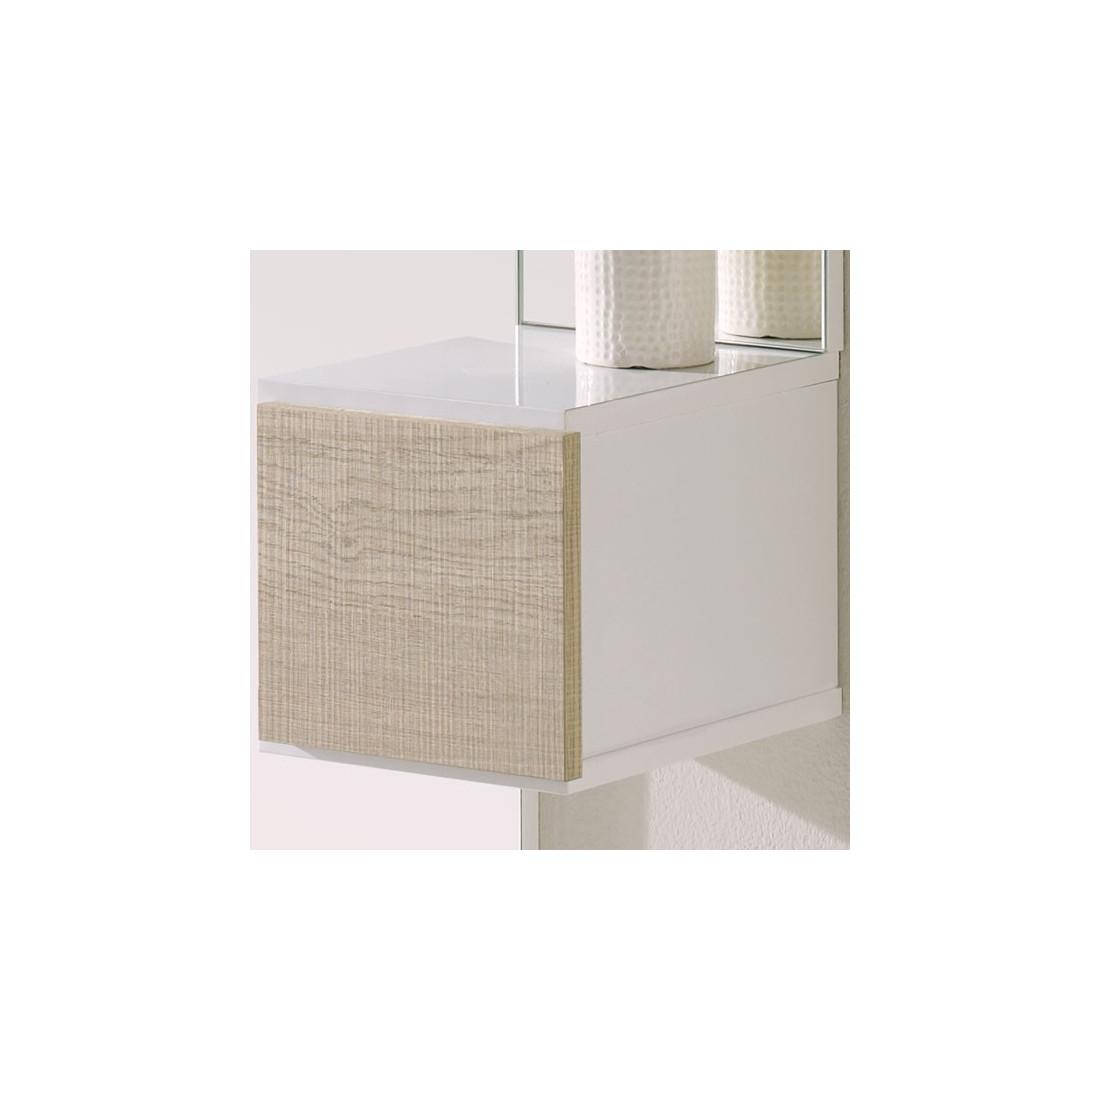 meuble d 39 entr e blanc ch ne clair miroir sirra petits meubles. Black Bedroom Furniture Sets. Home Design Ideas